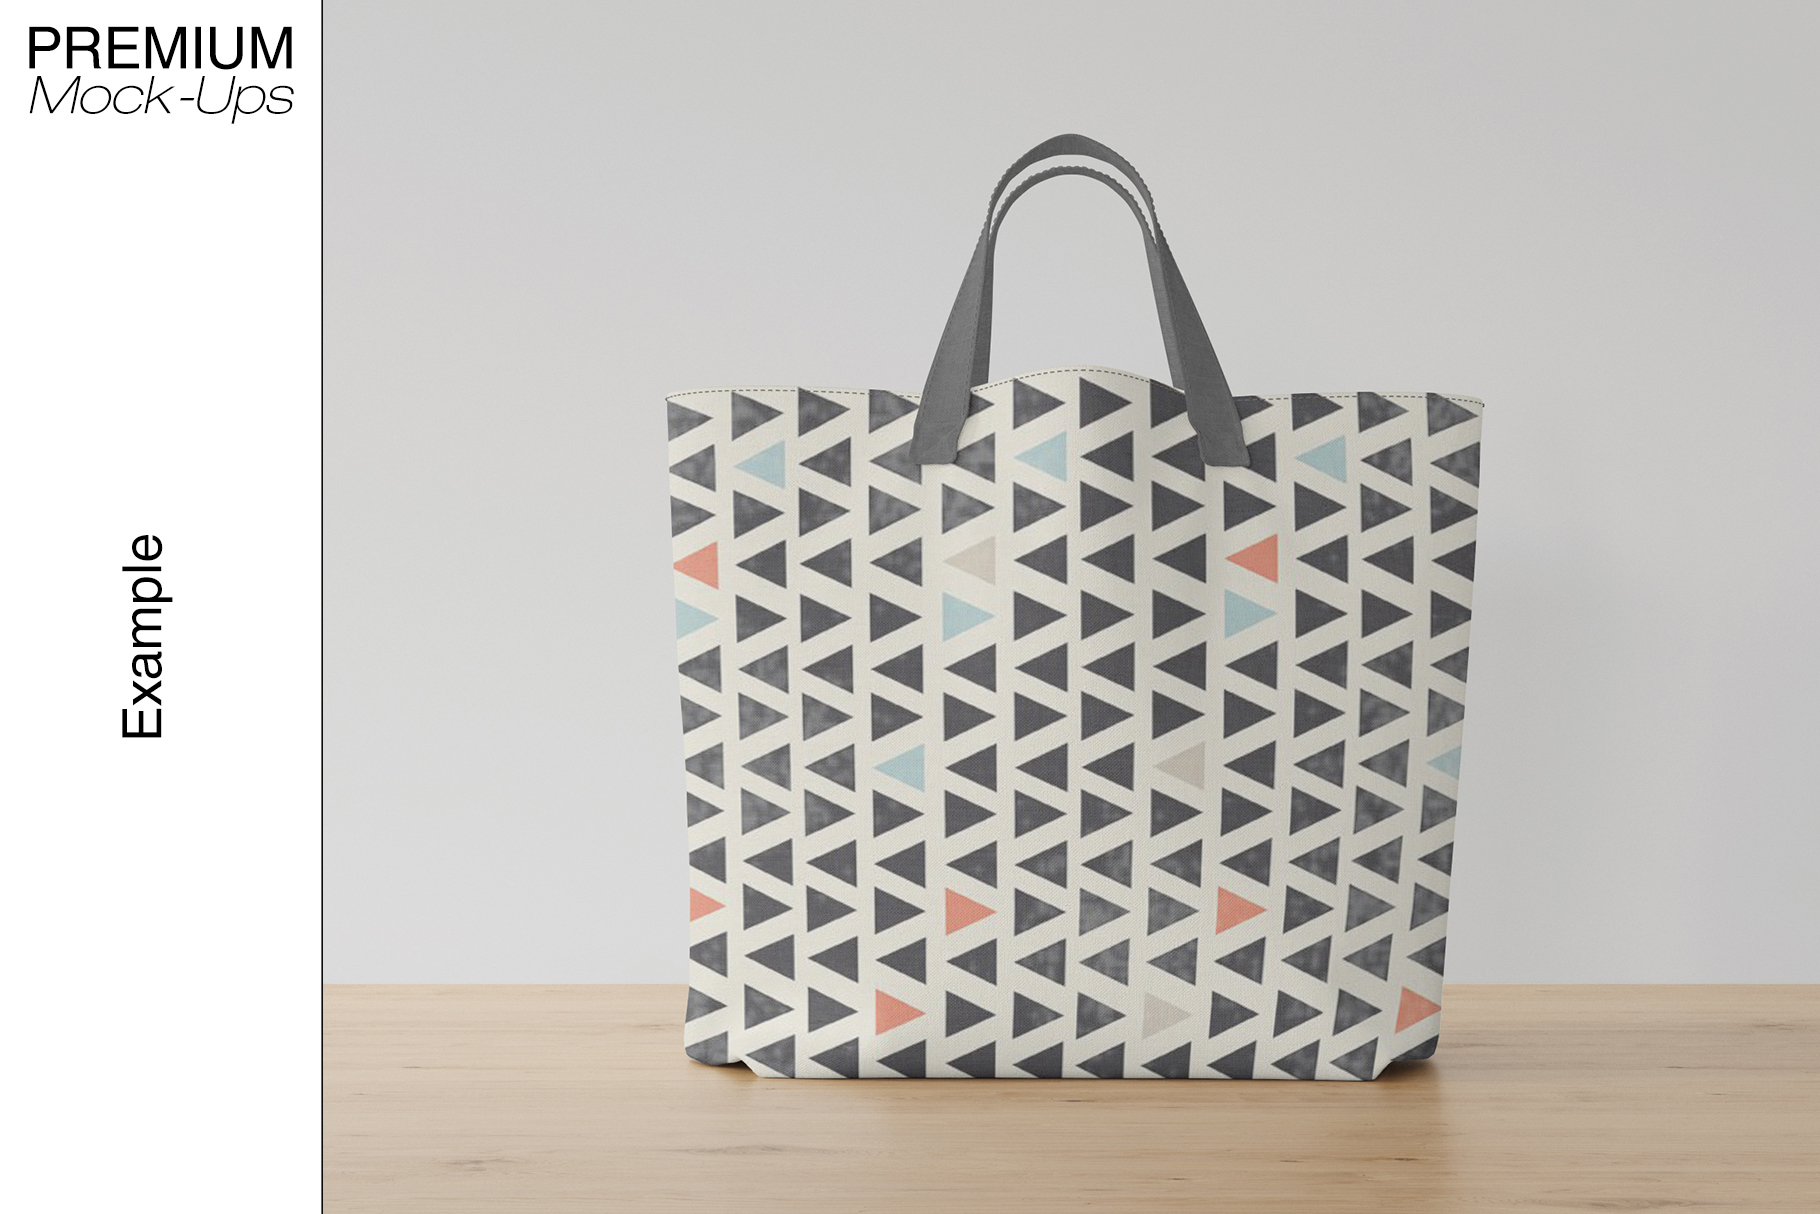 Tote Canvas Bag Mockups example image 4